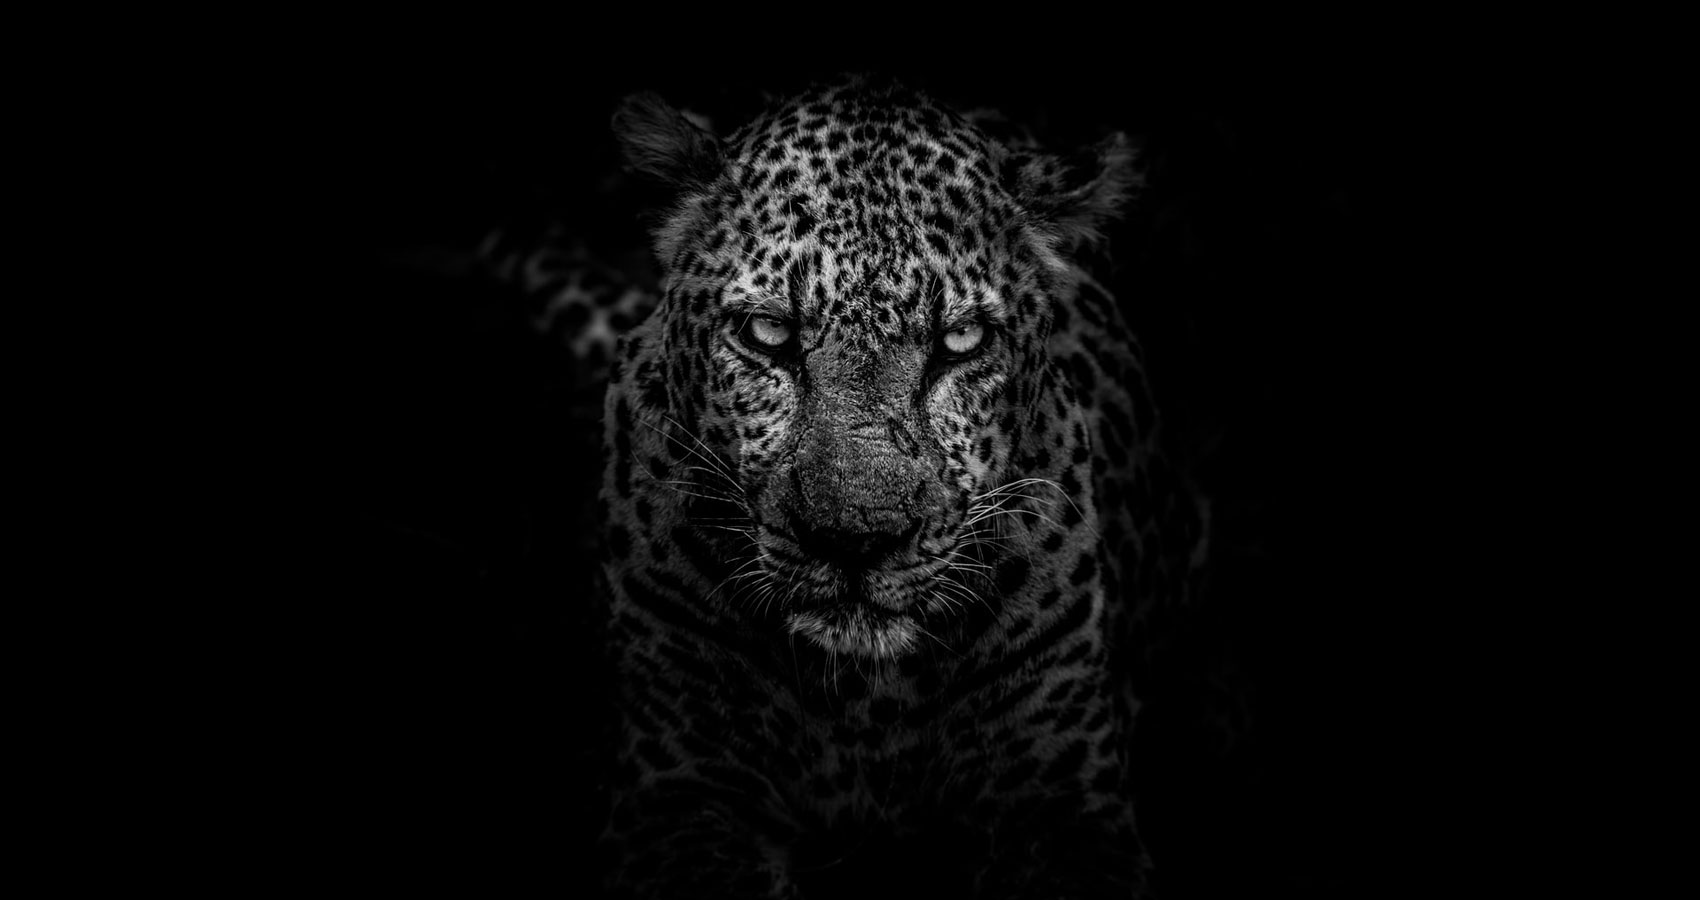 Leopard, a poem written by Stanley Wilkin at Spillwords.com